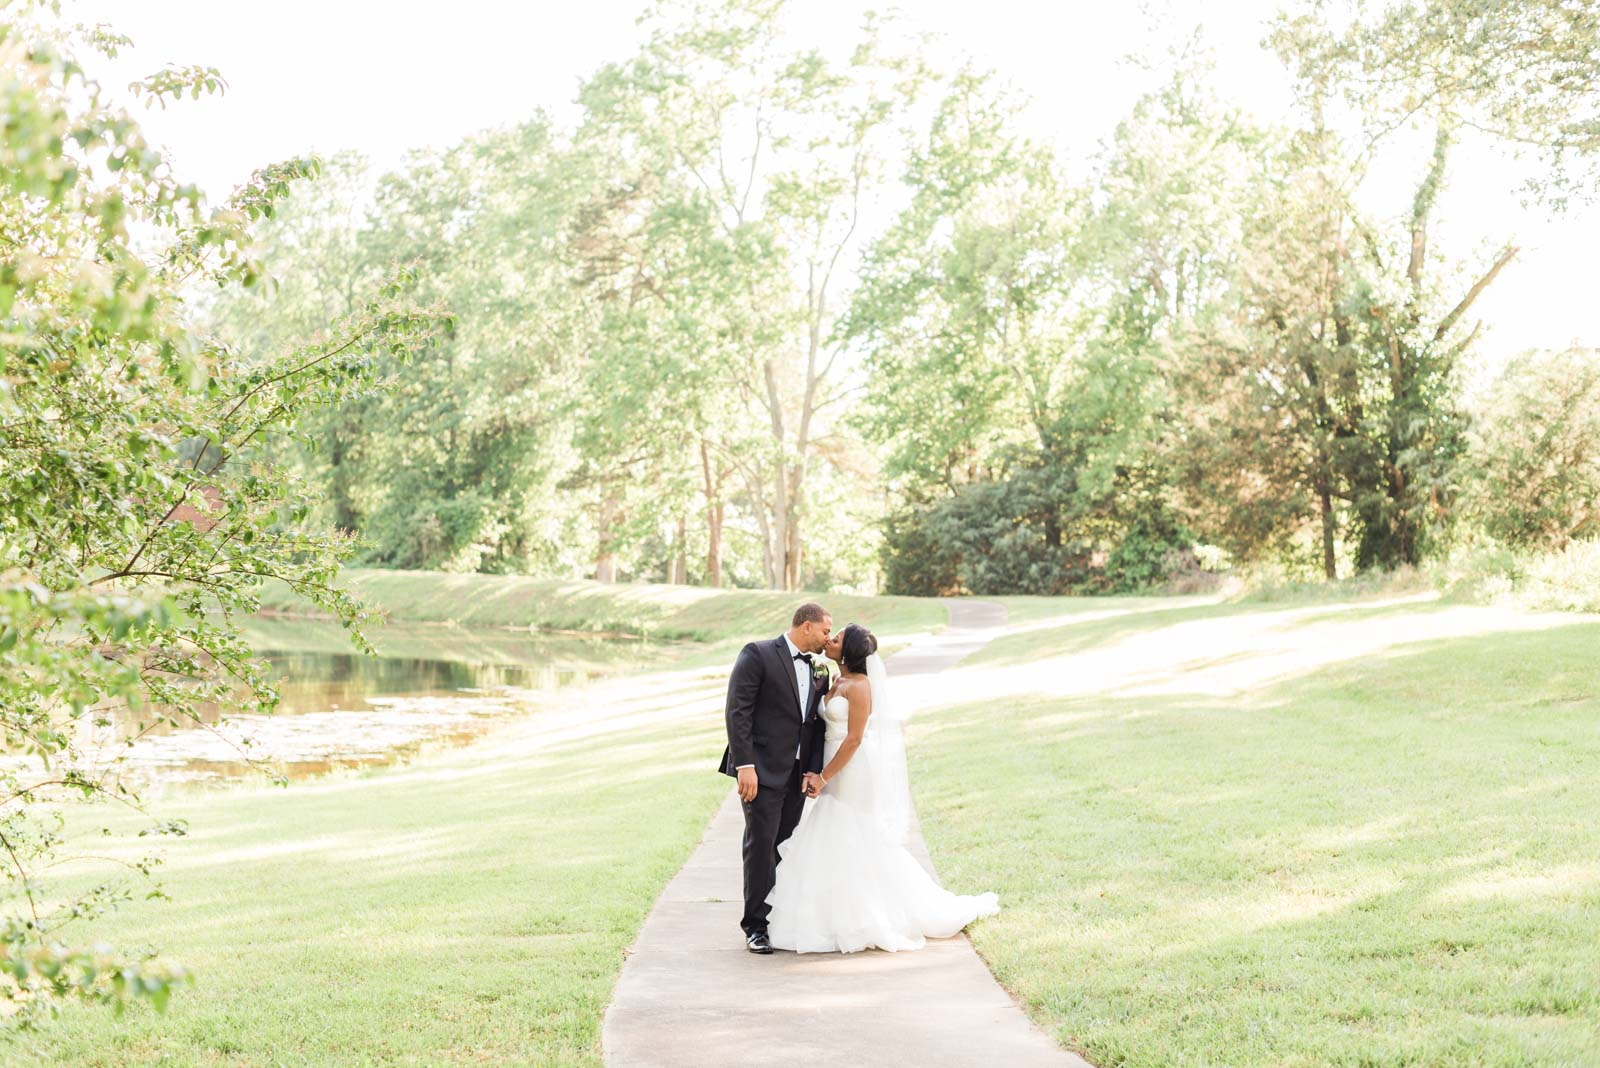 Noah's Event Venue Wedding Markie Walden Photography-63.jpg